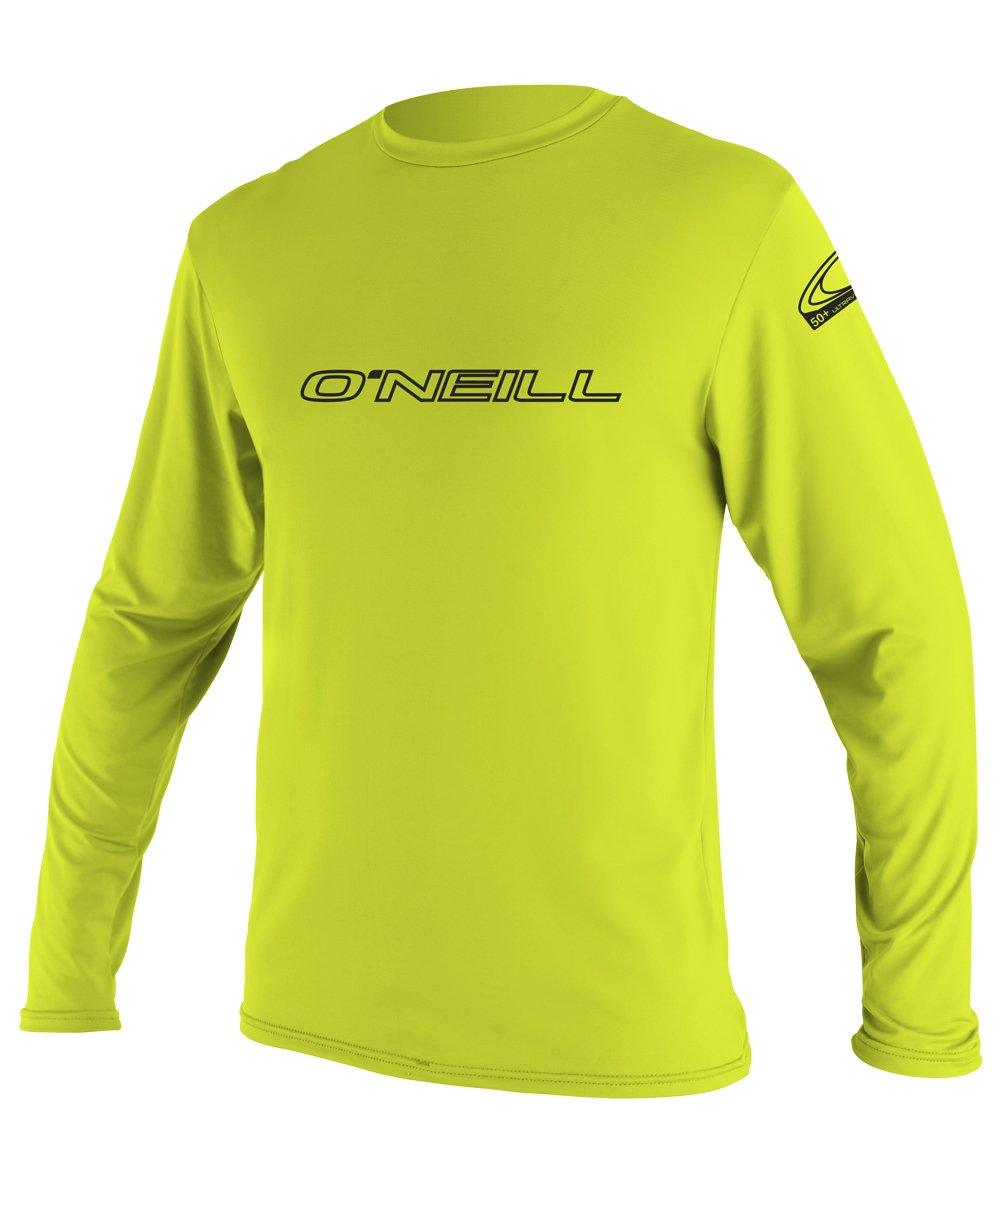 O'Neill Youth Basic Skins UPF 50+ Long Sleeve Sun Shirt, Lime, 10 by O'Neill Wetsuits